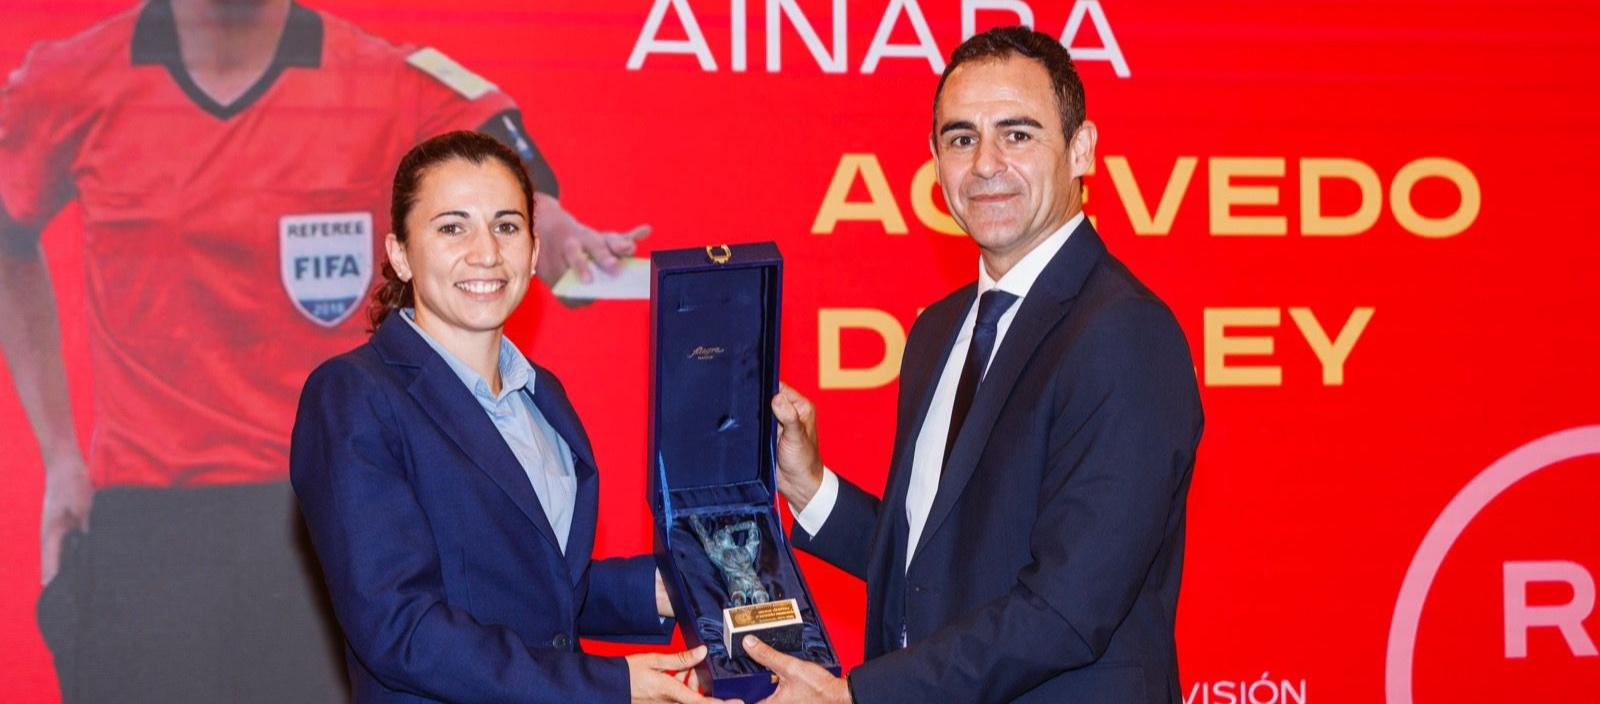 Ainara Acevedo i Matilde Esteves reben els premis Vicente Acevedo